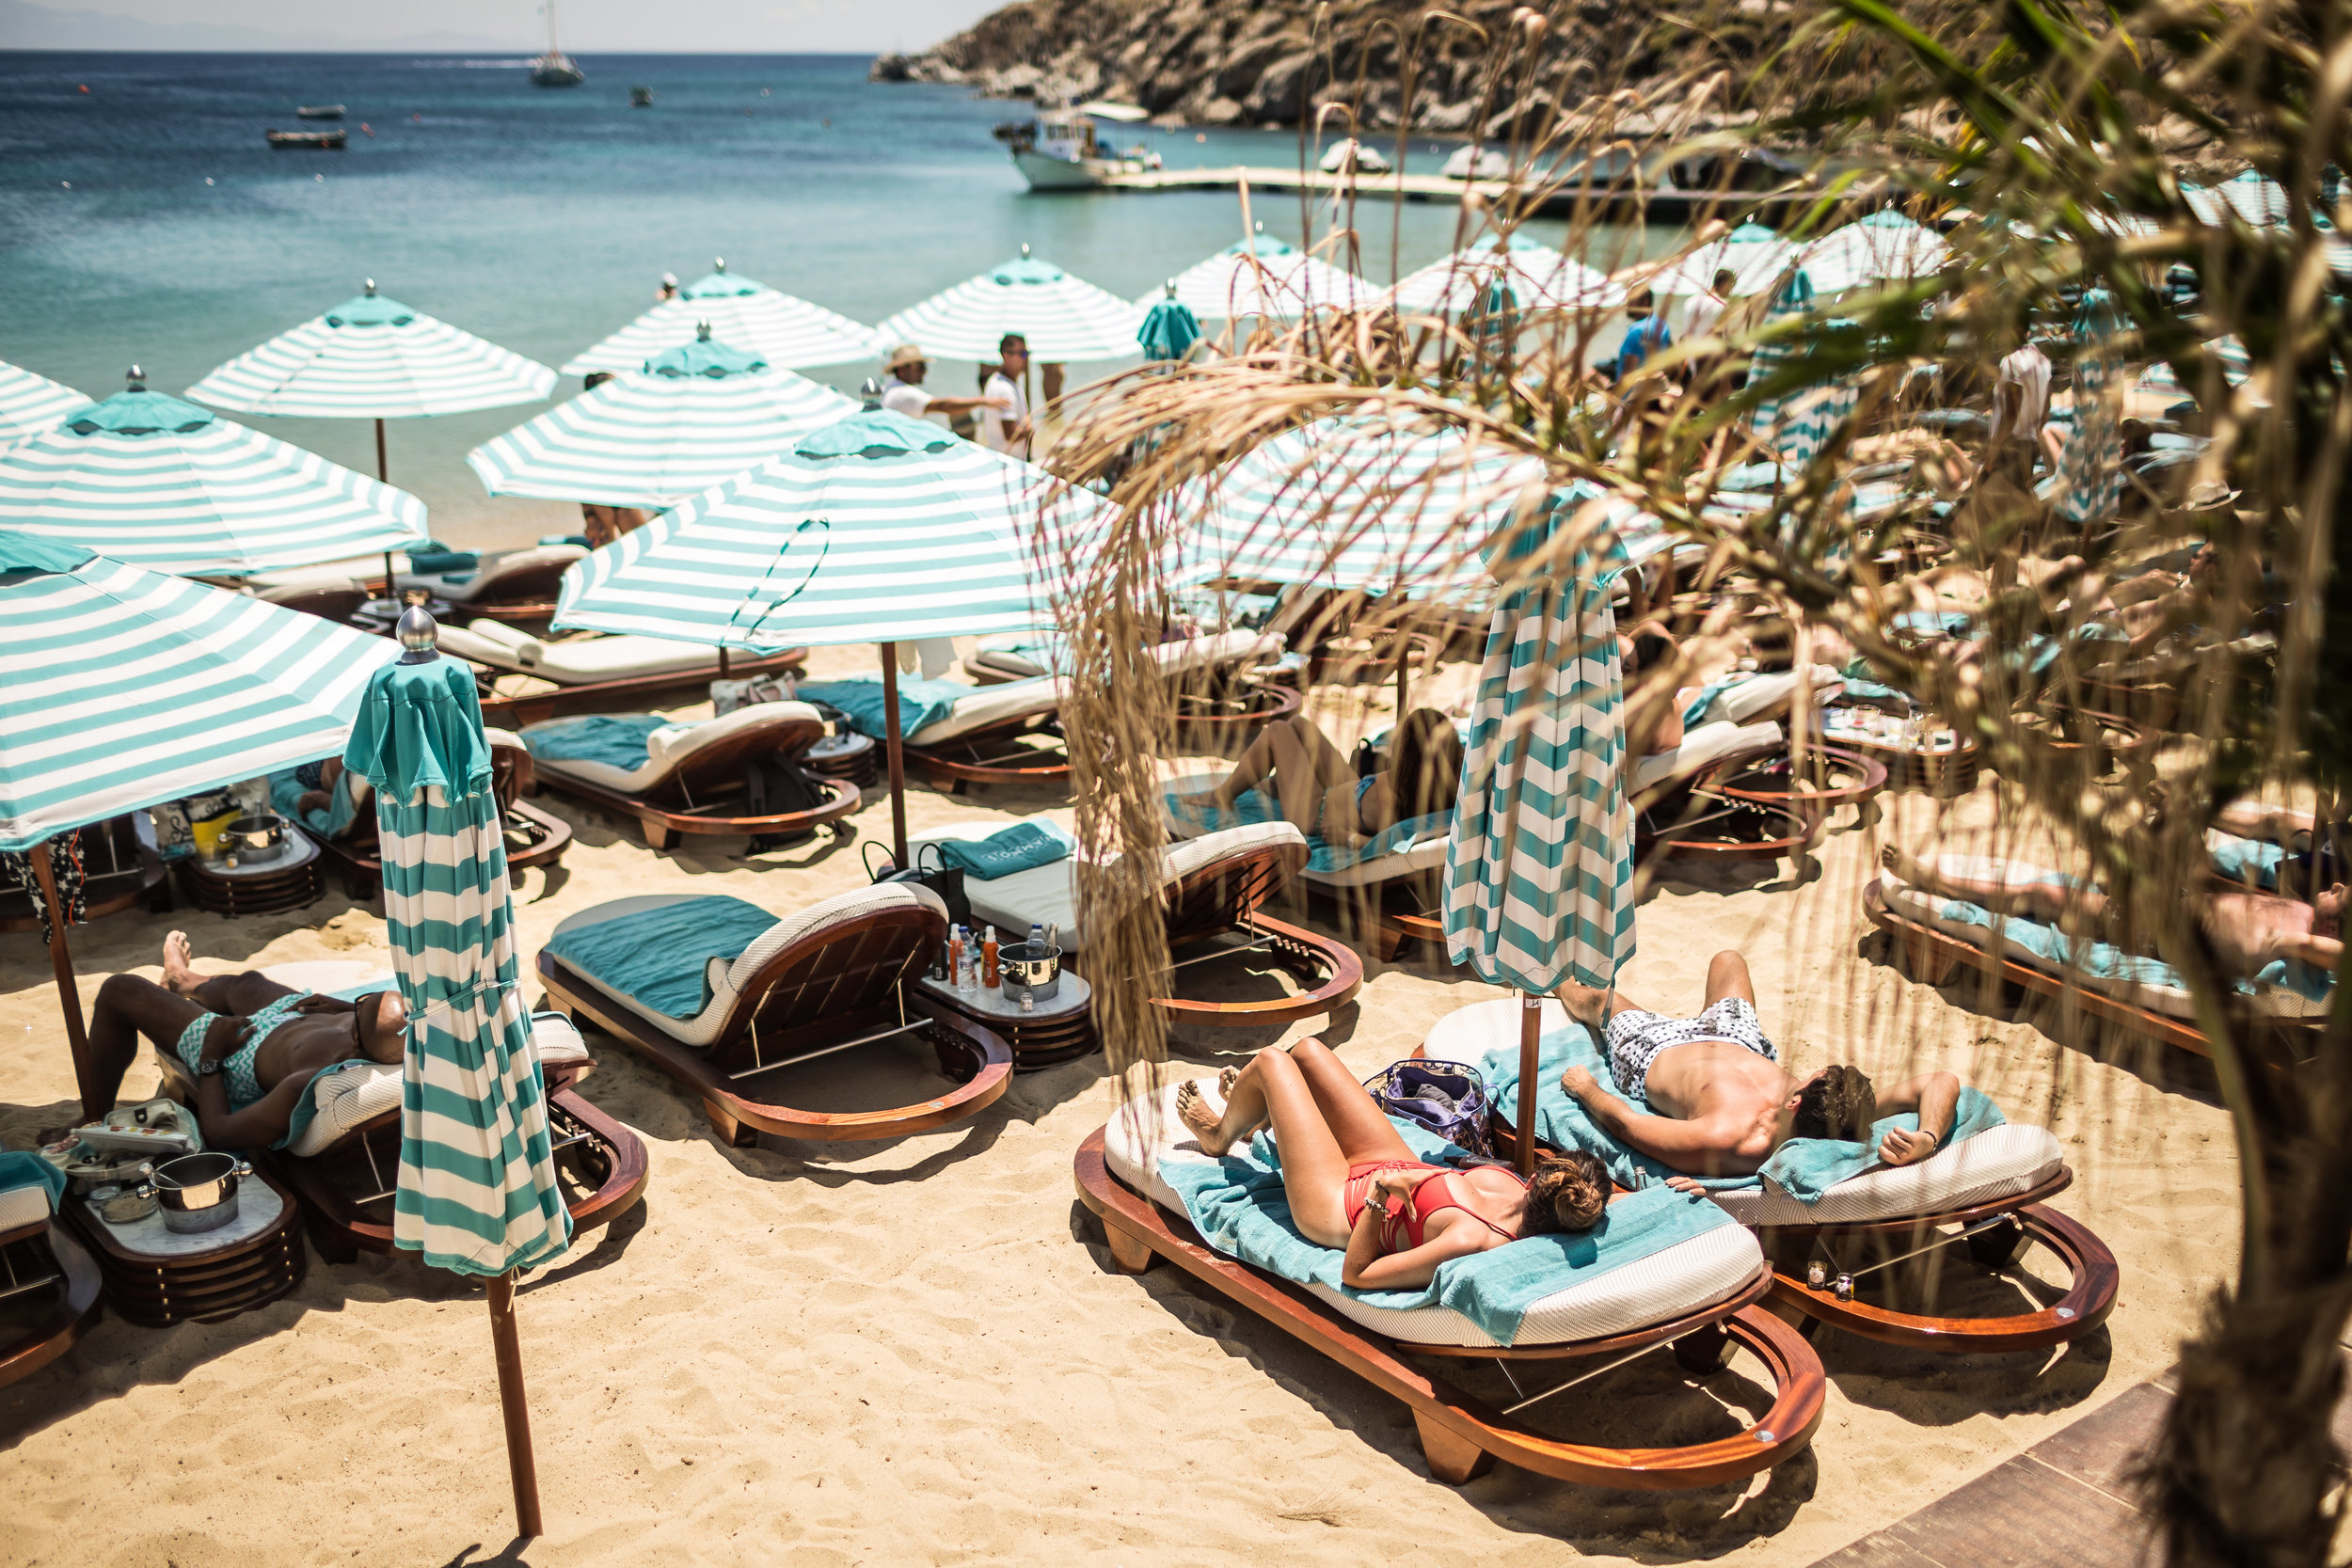 Seora Features In The Best Beach Club In The World Nammos Mykonos Beach - Masha Shapiro Agency UK.jpg